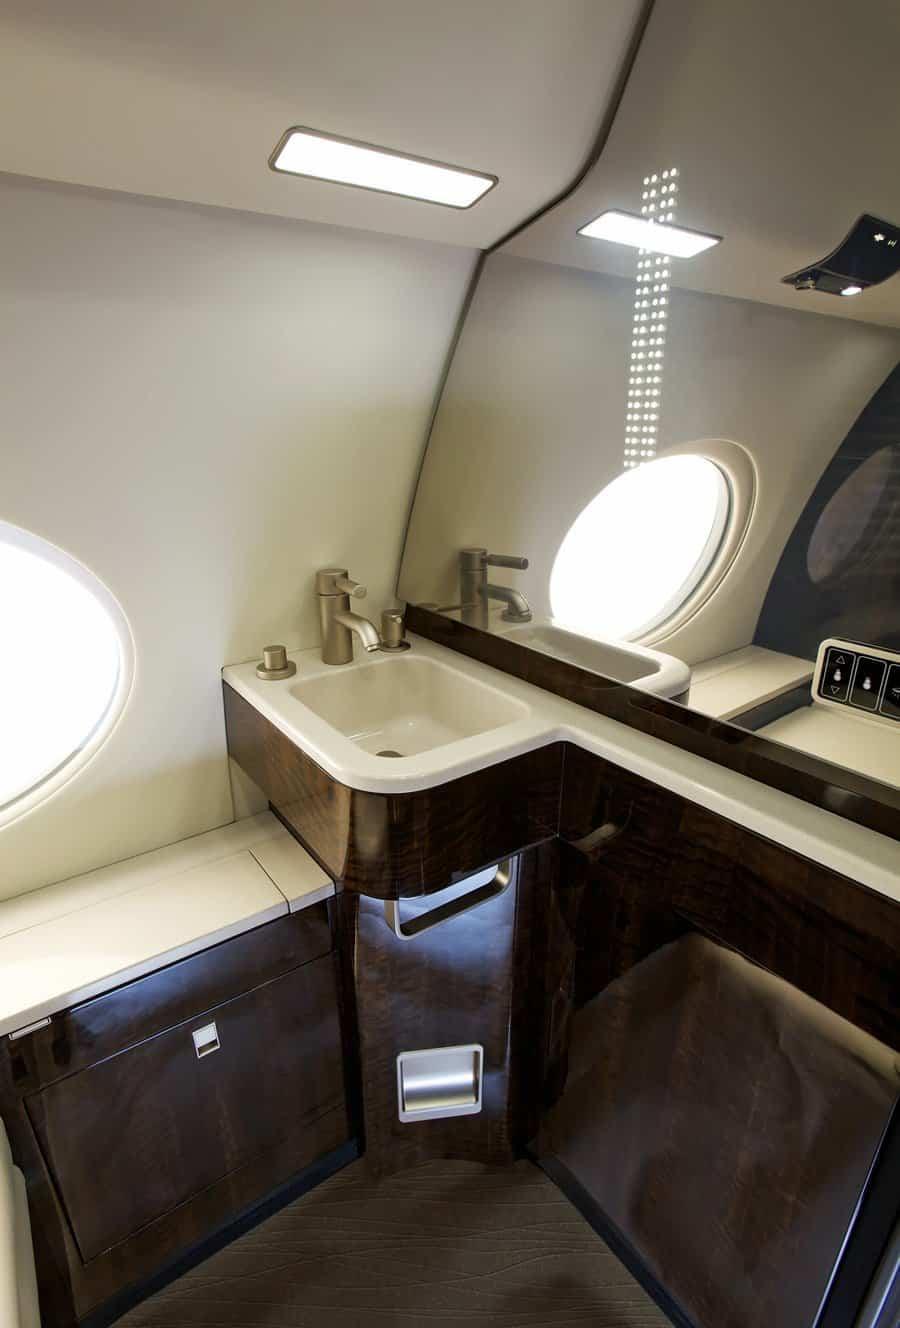 jet privado de Rupert Murdoch baño de lujo